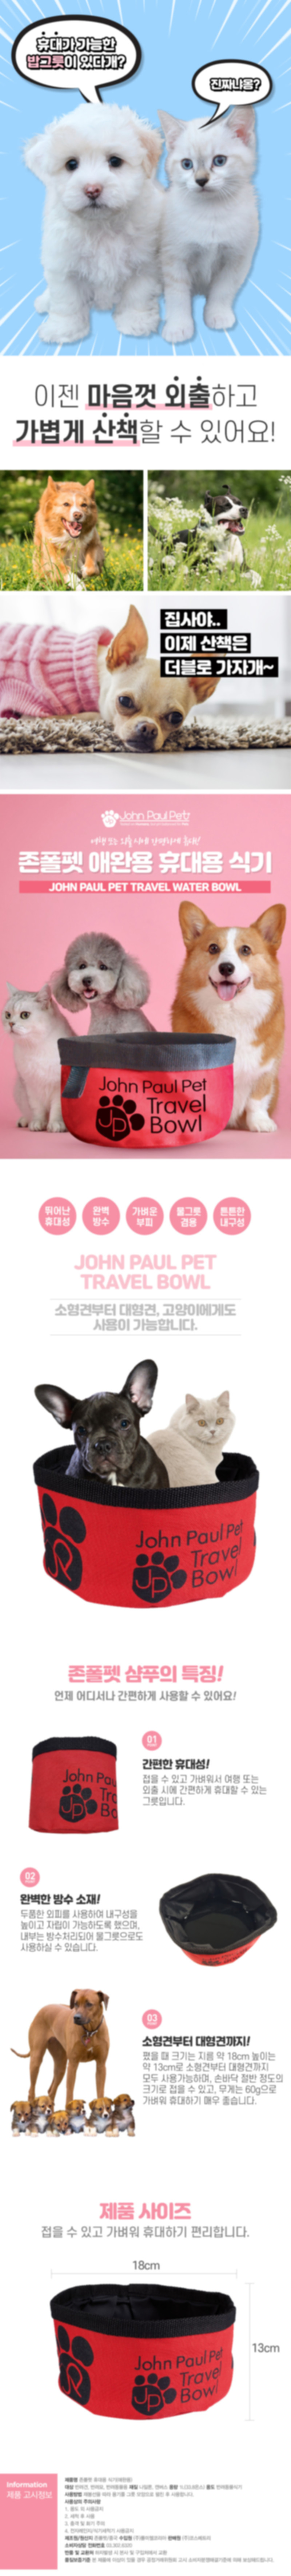 johnpaulpet_travel_bowl_800.jpg